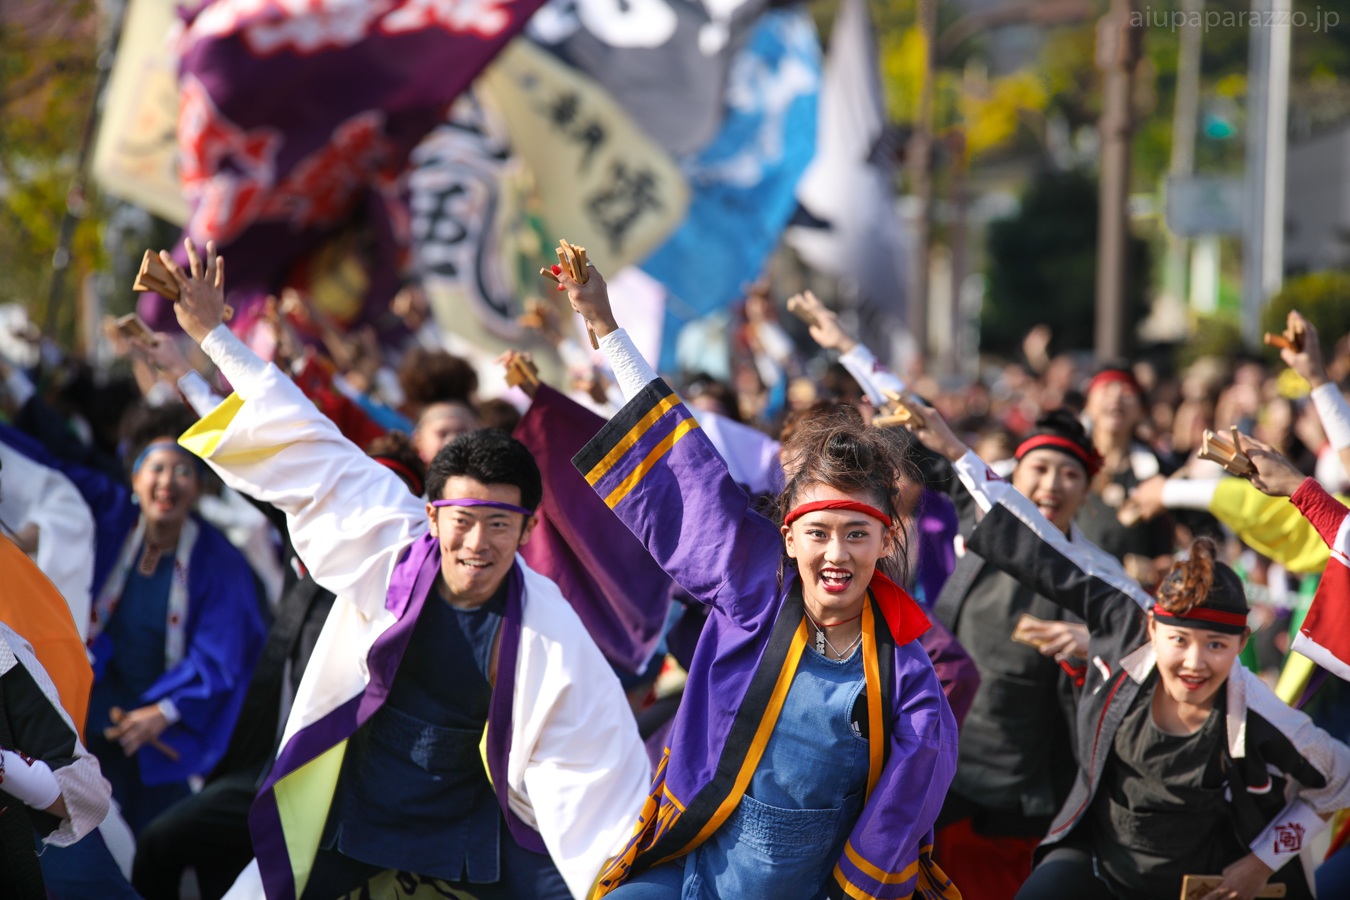 kanpachi2016oyachai-38.jpg